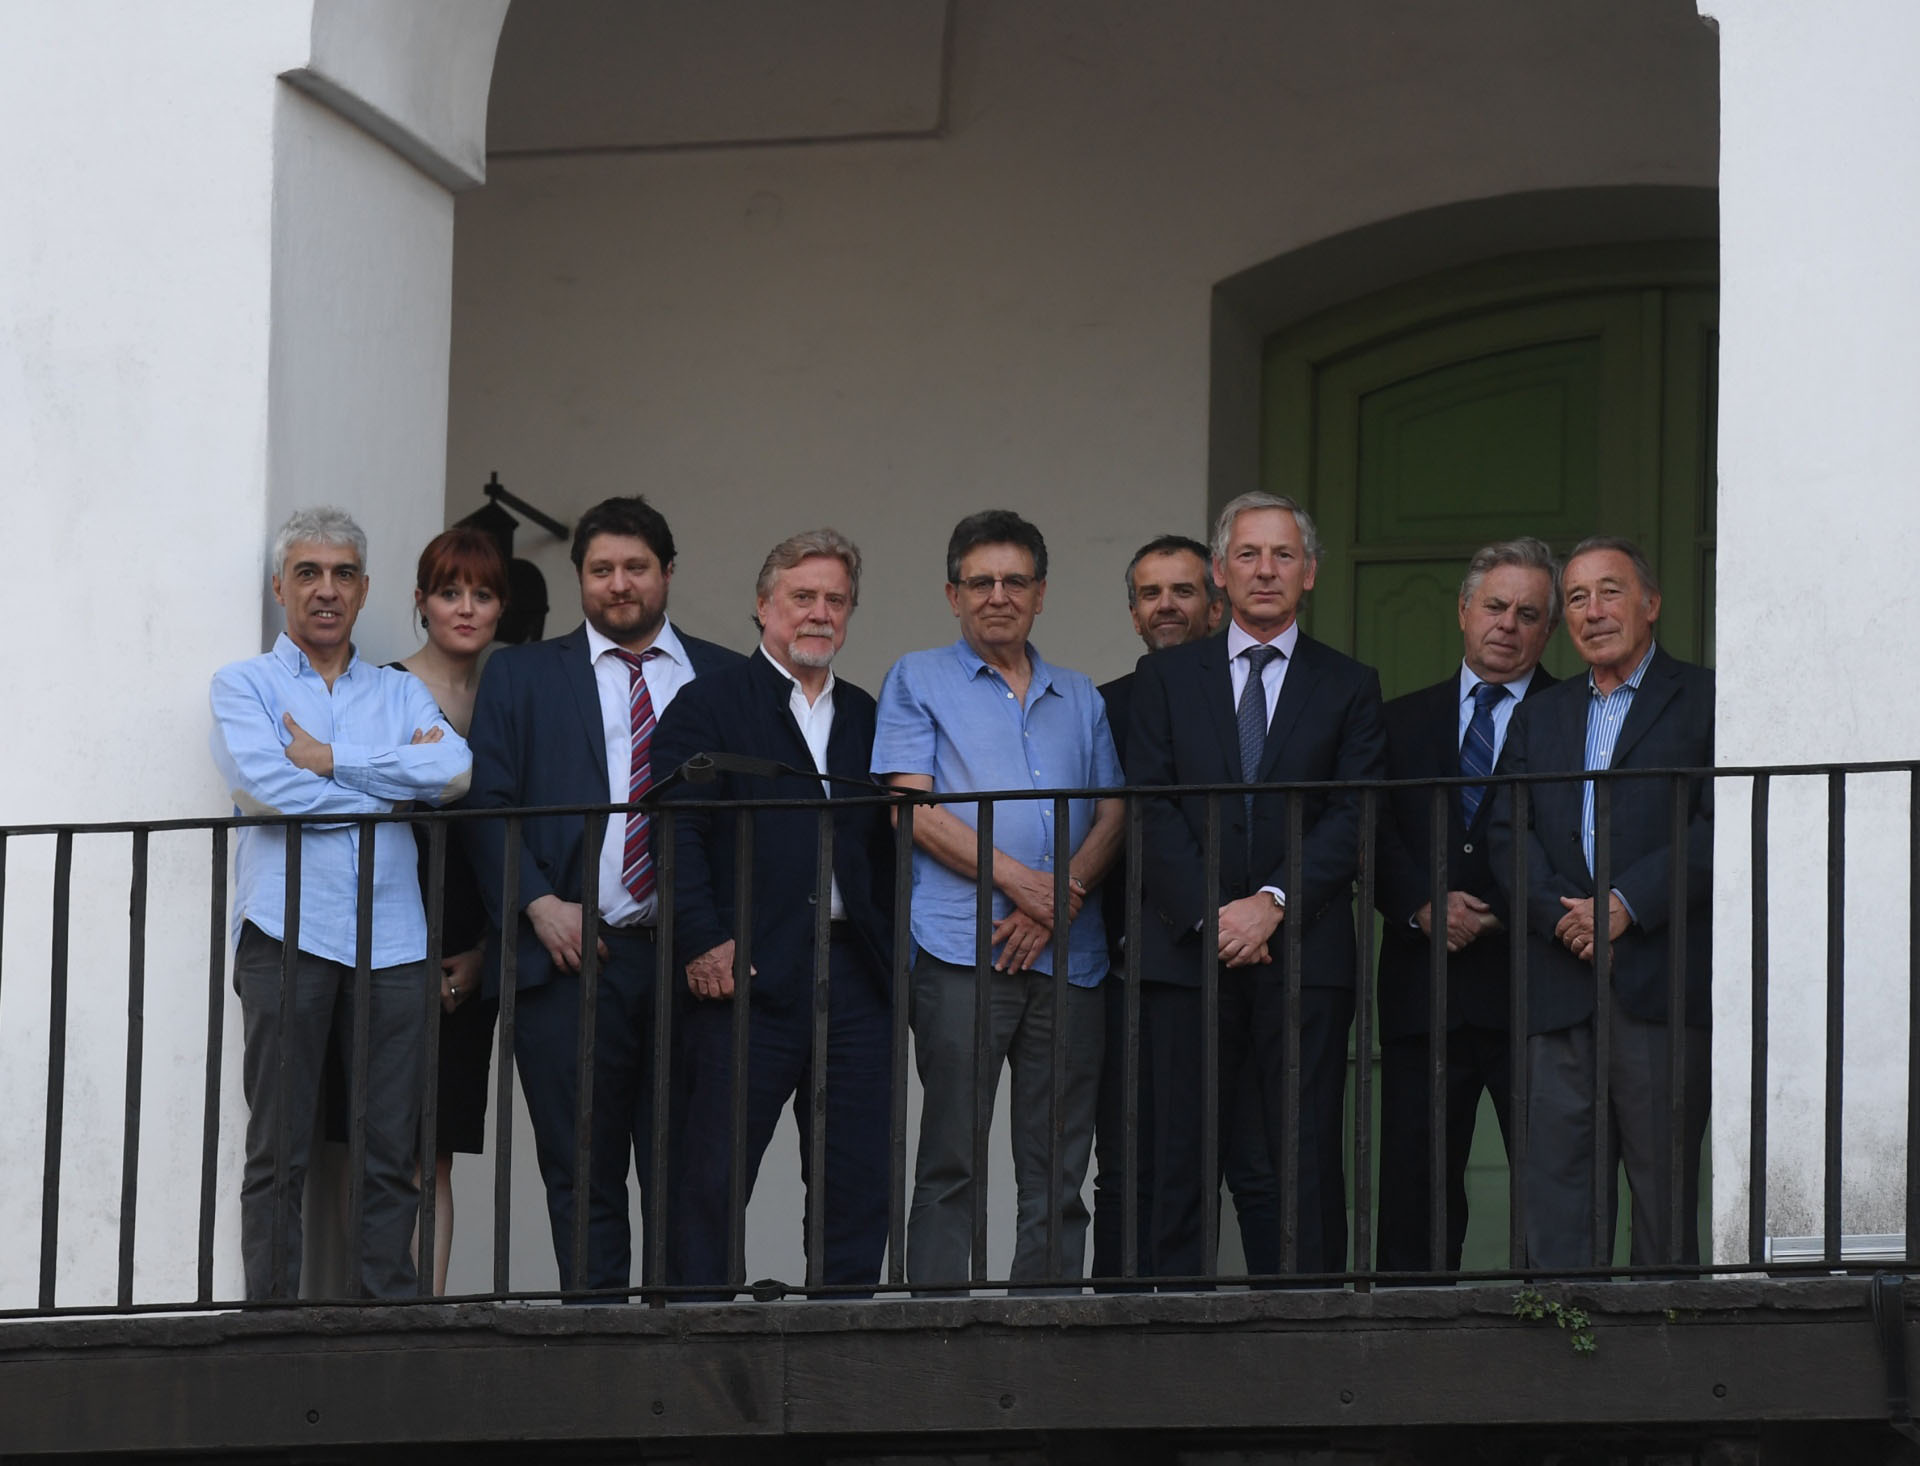 Francisco Mármol, Úrsula Ures Poreda, Nicolás Wiñazki, Ricardo Kirschbaum, Roberto Guareschi, Marcelo Longobardi, Roberto García, José Ignacio López